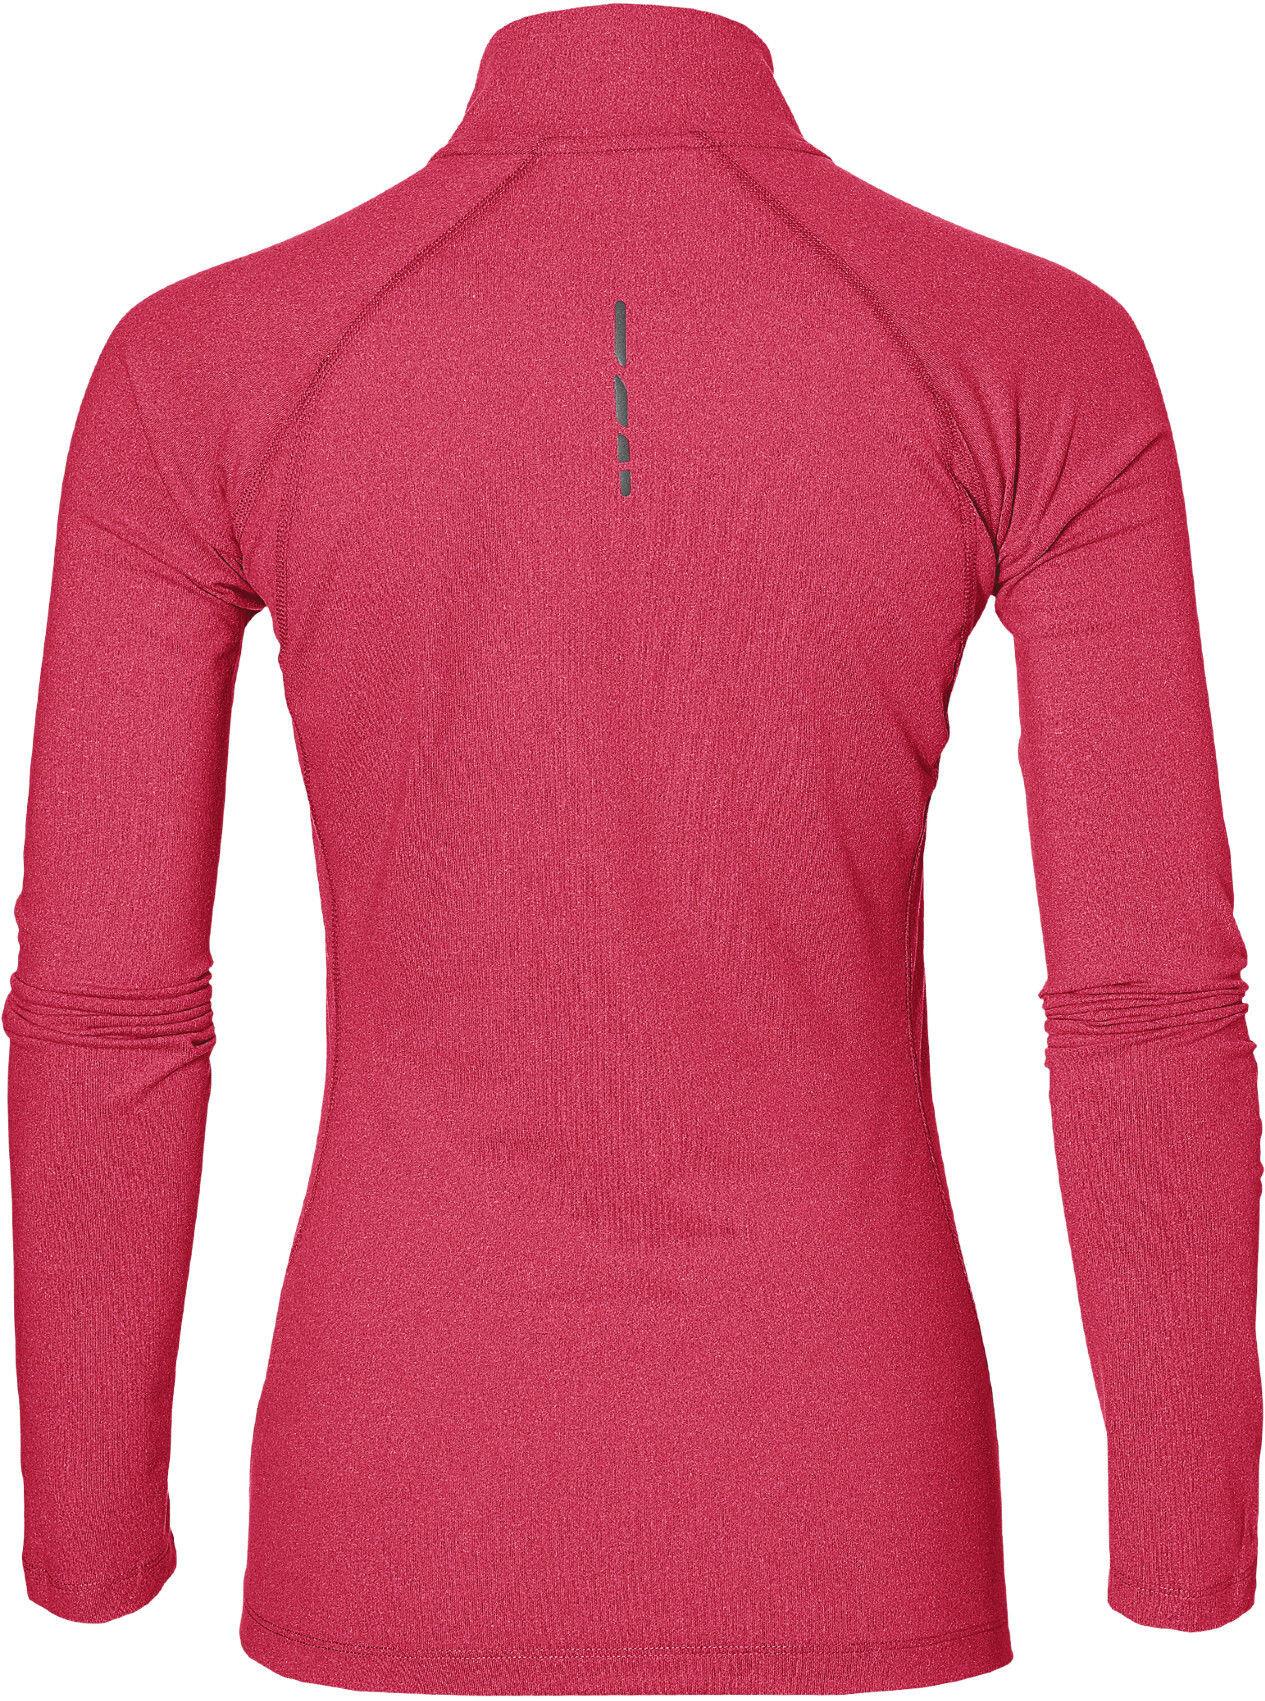 1a071285490 asics LS 1/2 Zip Jersey Hardloopshirt lange mouwen Dames rood l ...